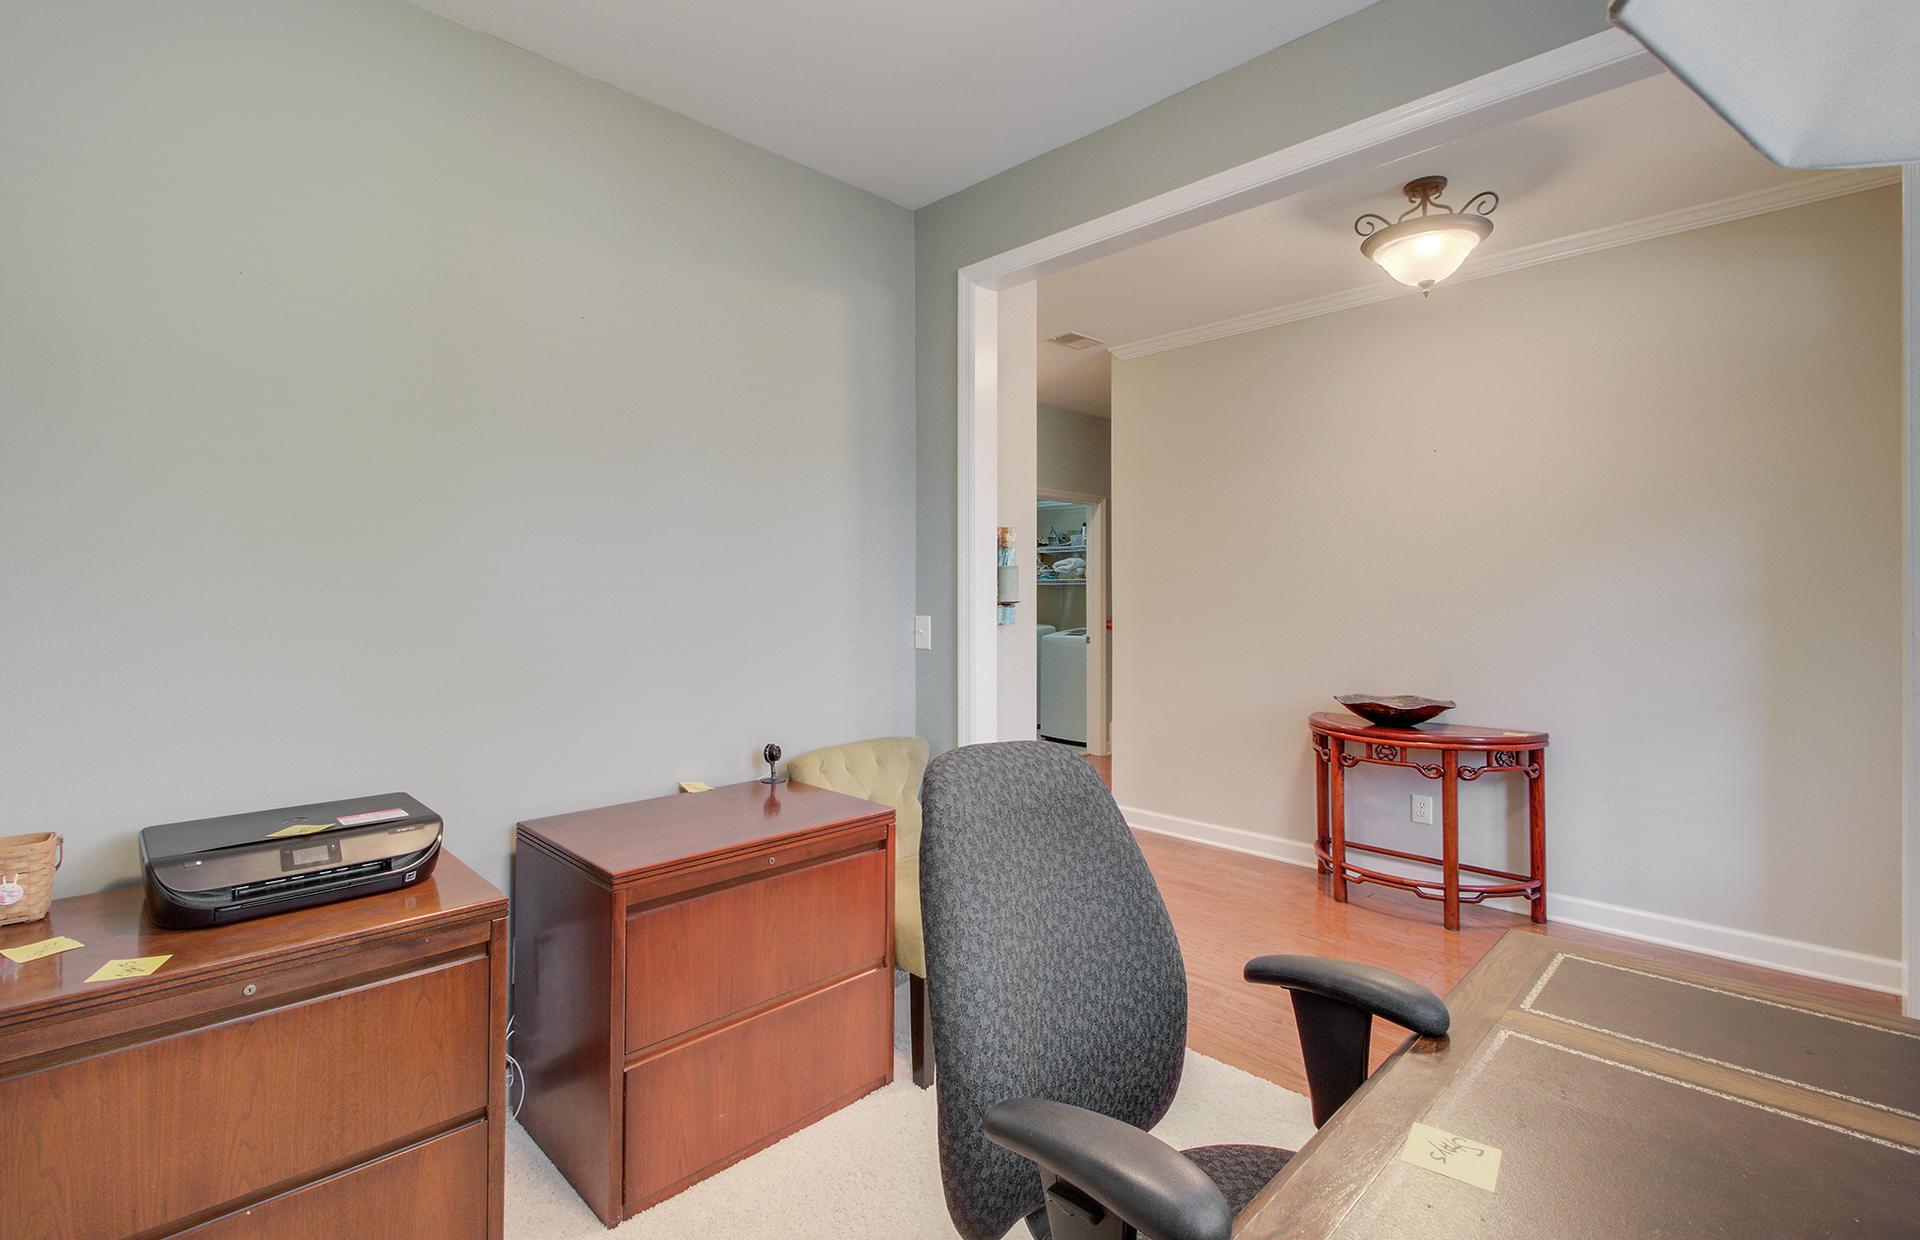 Dunes West Homes For Sale - 145 Fresh Meadow, Mount Pleasant, SC - 7